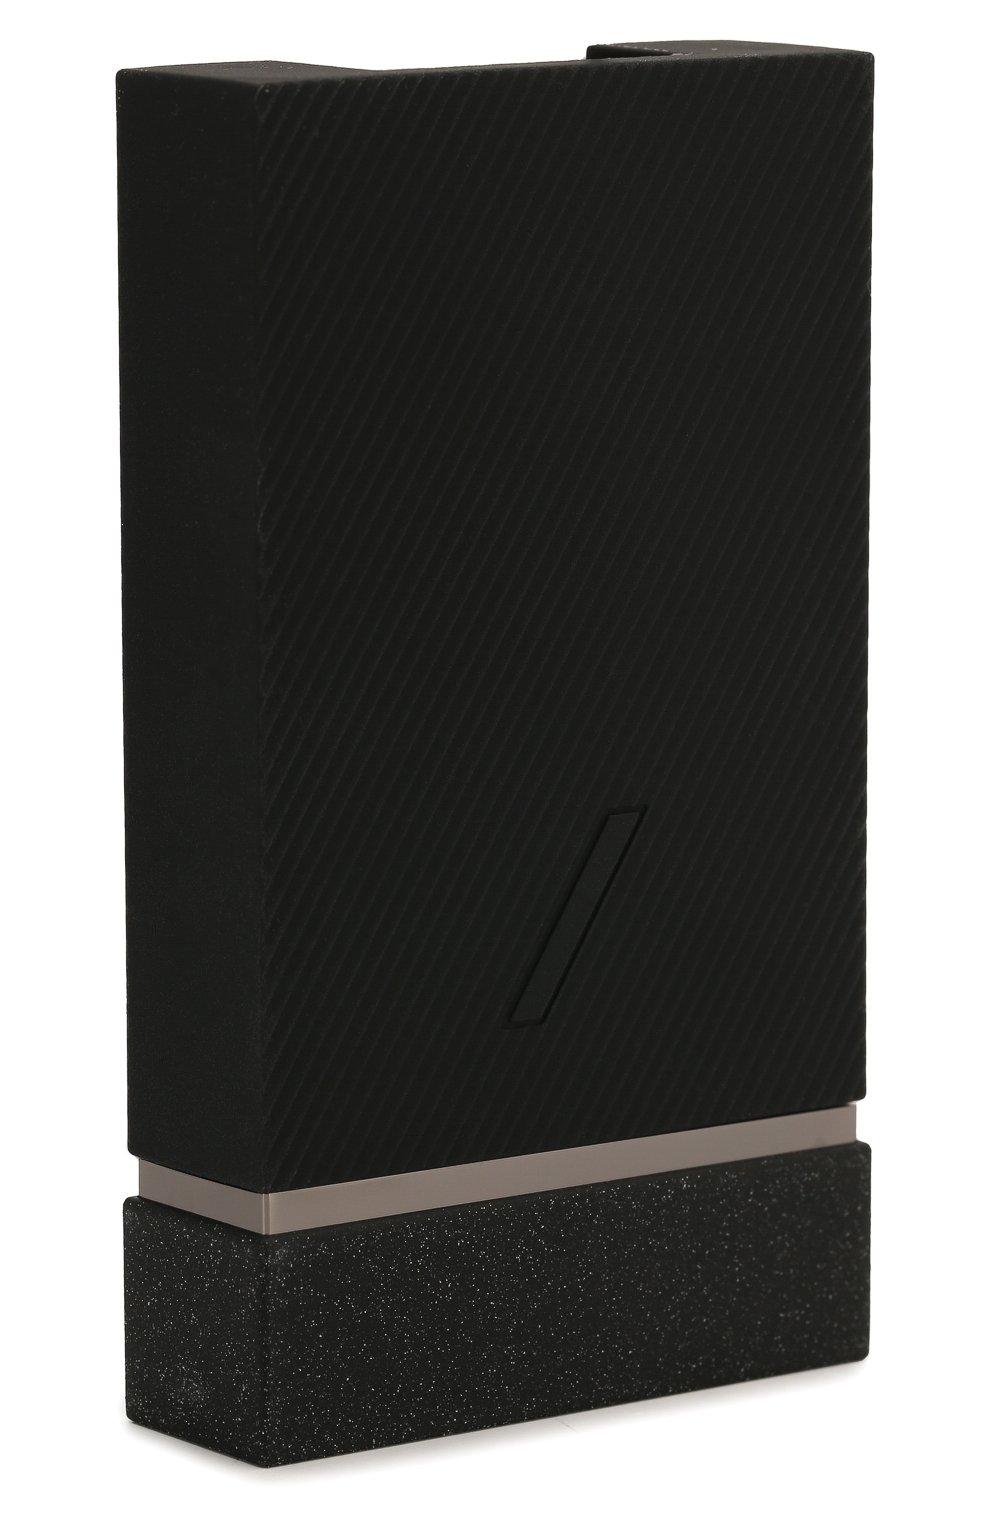 Сетевое зарядное устройство smart charger usb-a/usb-c NATIVE UNION серого цвета, арт. SMART-PD-GRY-INT   Фото 2